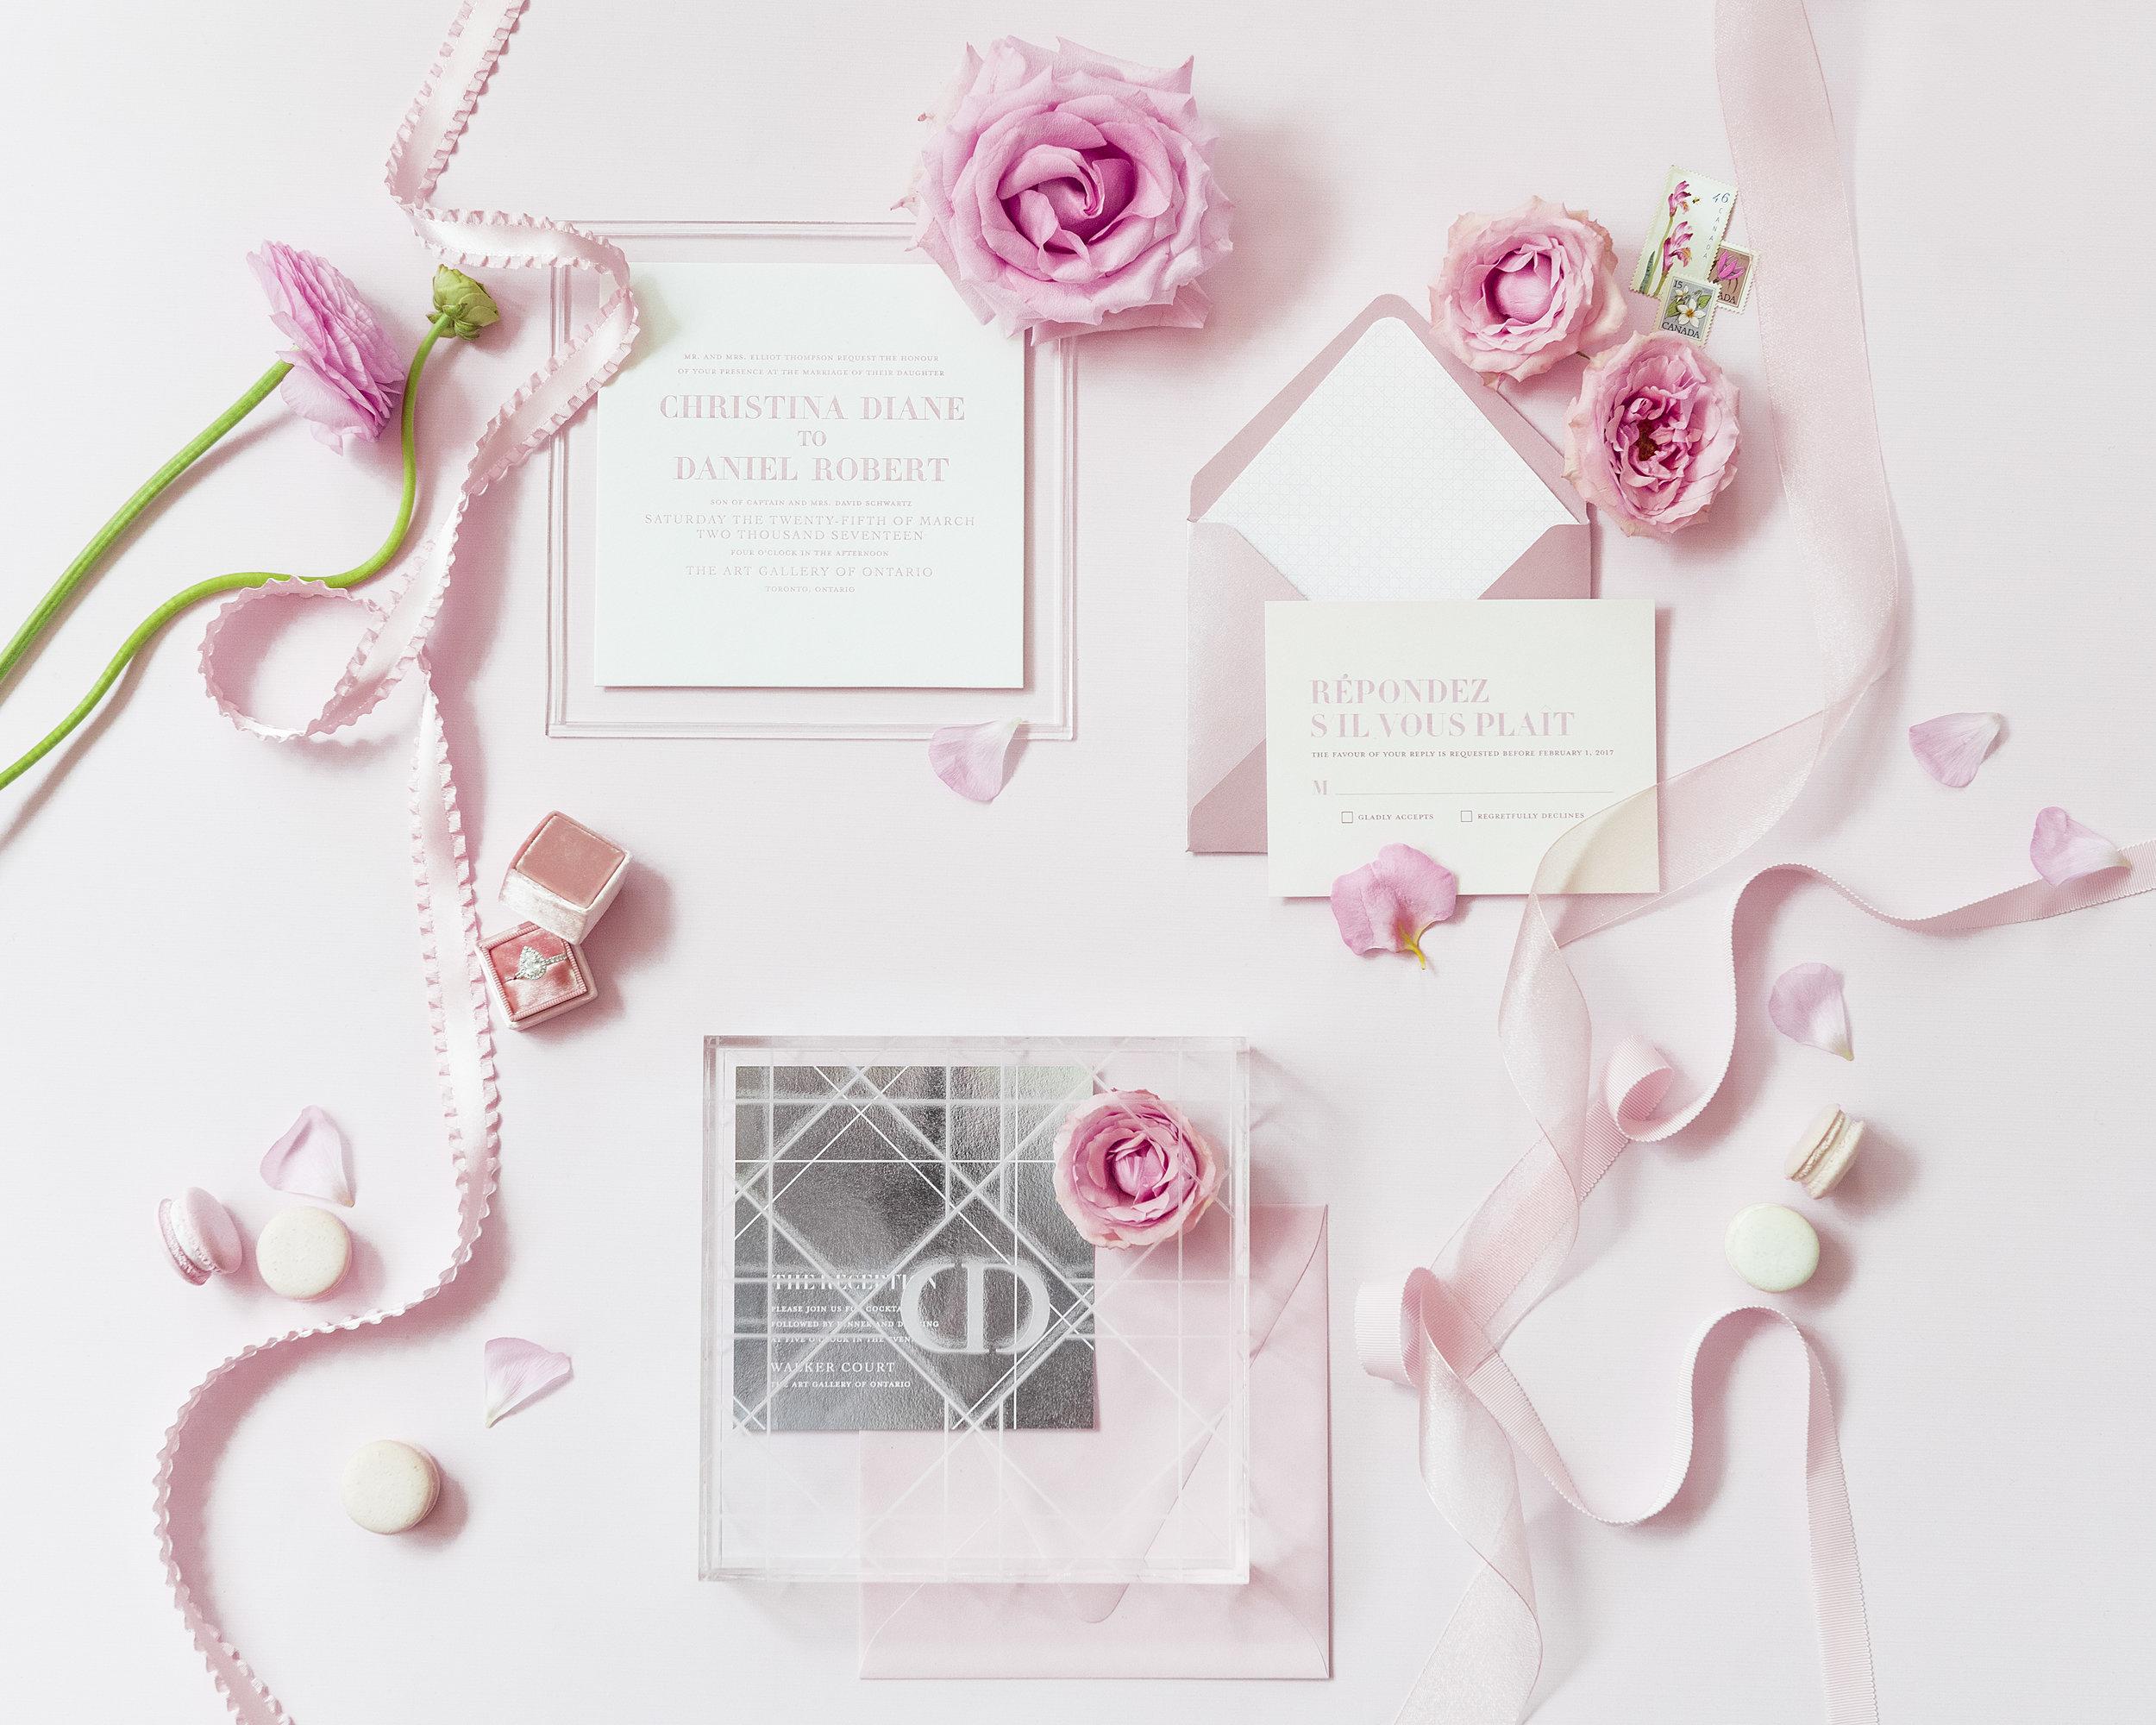 August In Bloom - Invitation Suite - Dior Darling (Wedluxe)